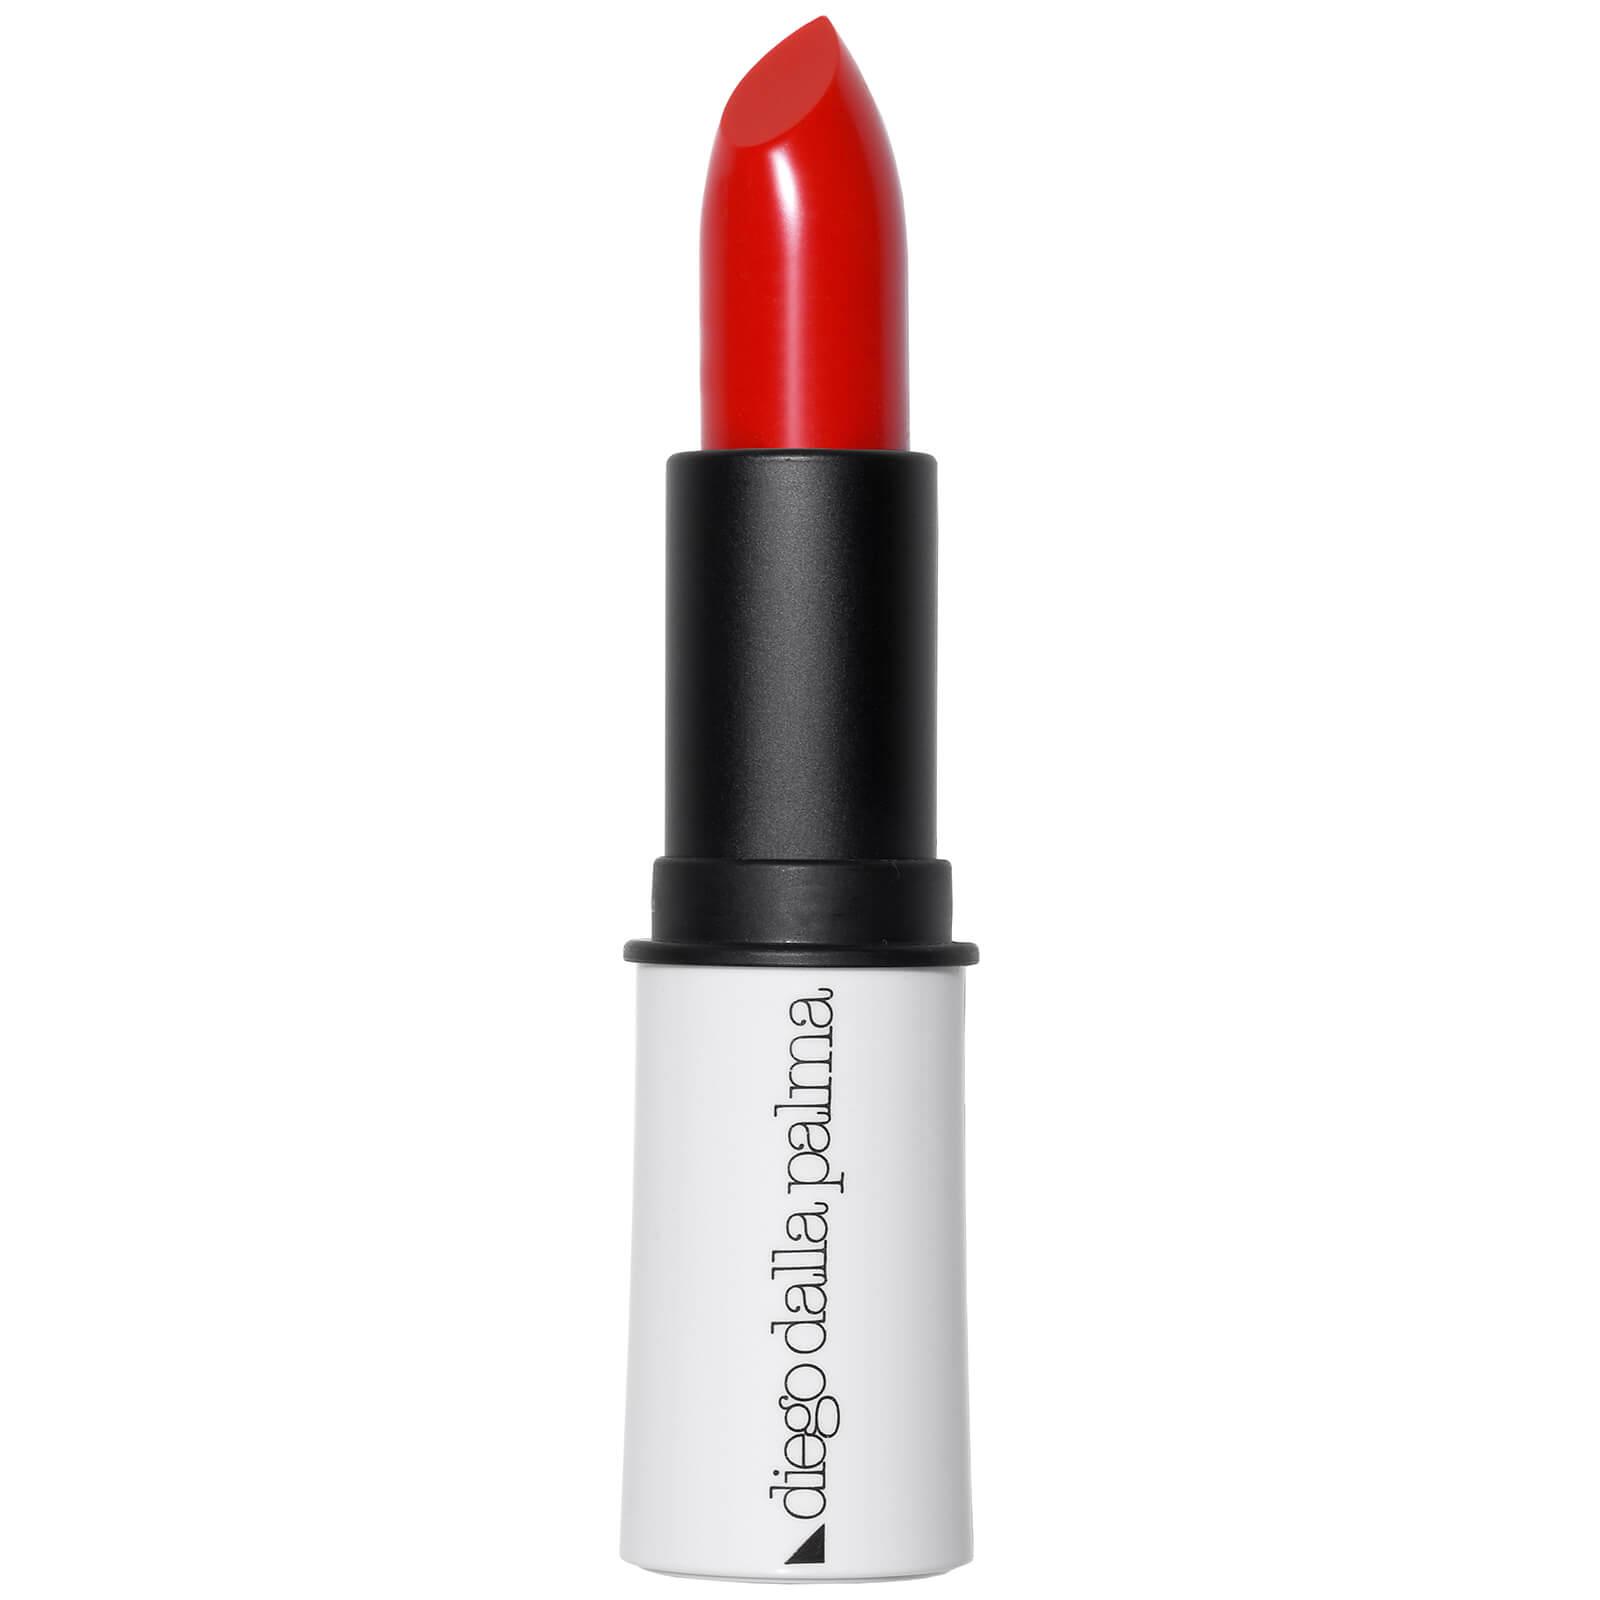 Diego Dalla Palma The Lipstick 3.5ml (Various Shades) - Deep Red